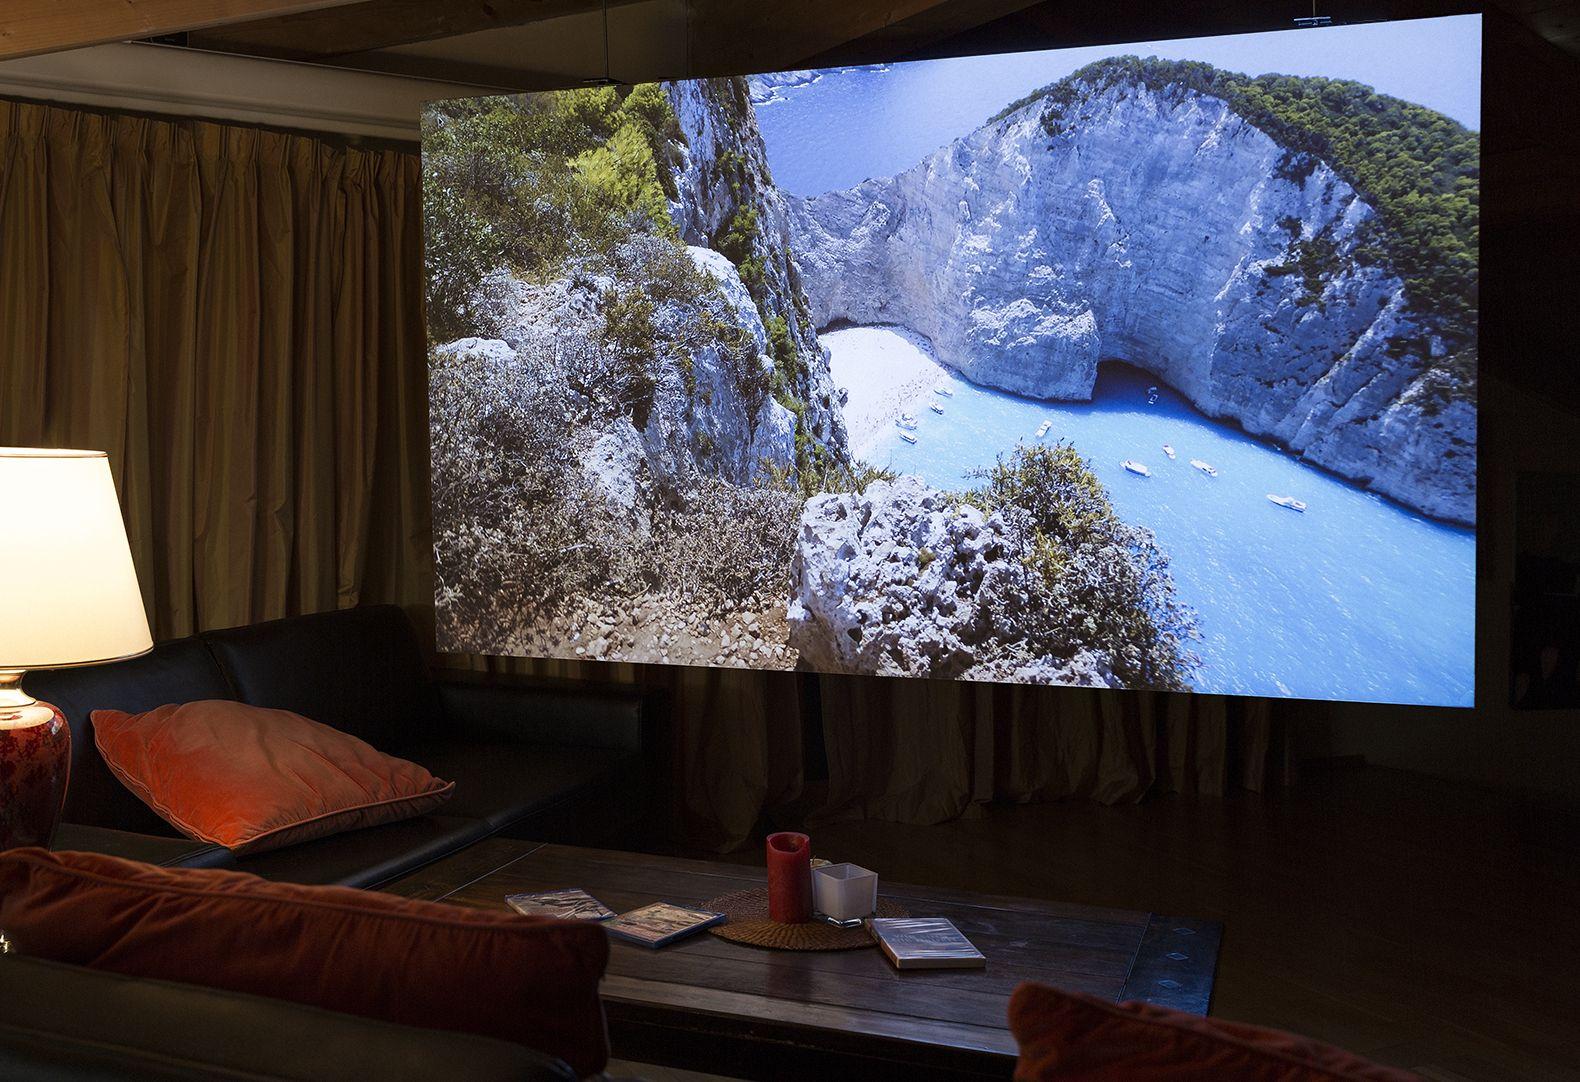 Beamer leinwand heimkino projektionswand g nstig kaufen - Beamer im wohnzimmer ...